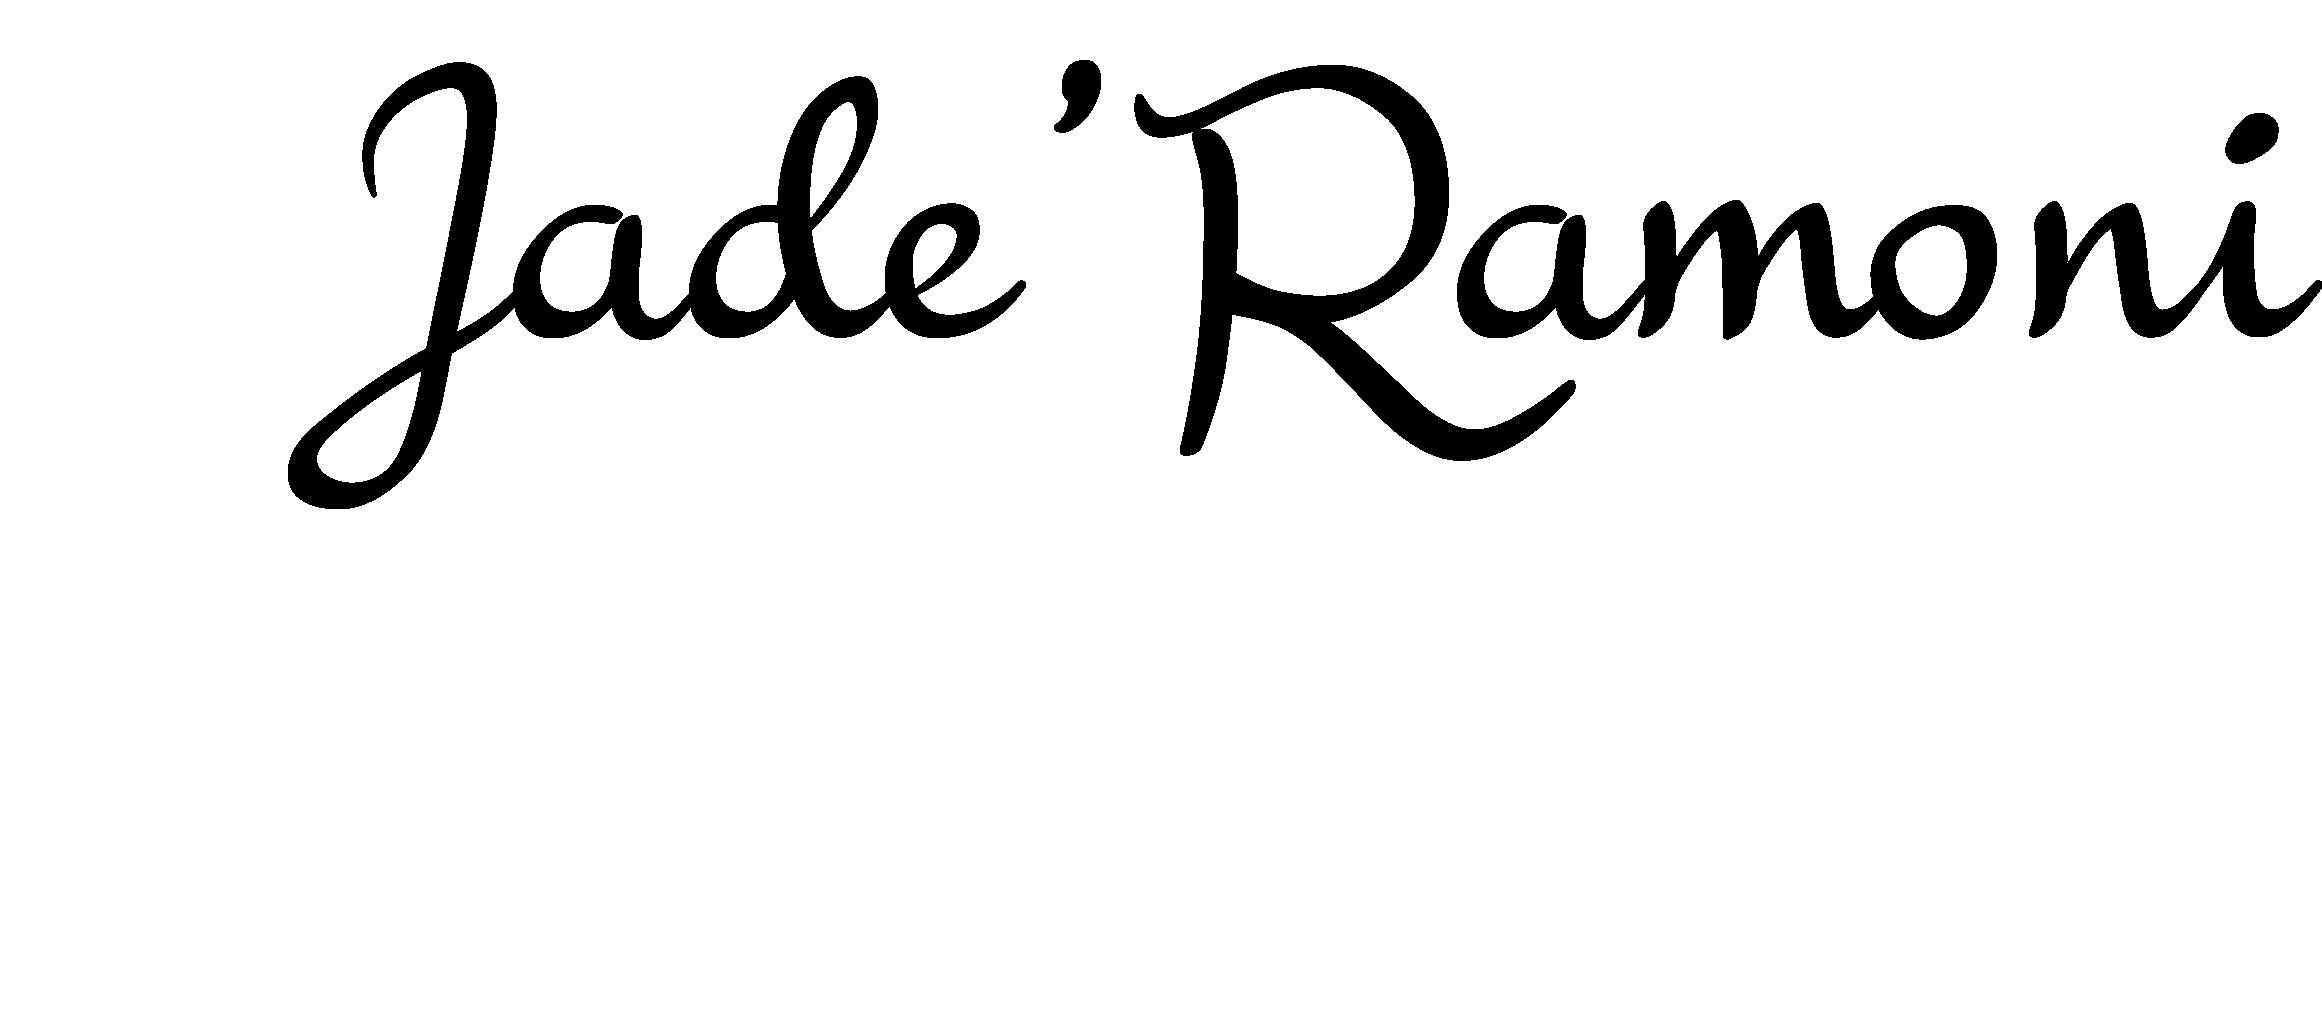 ramon Ellsworth's Signature